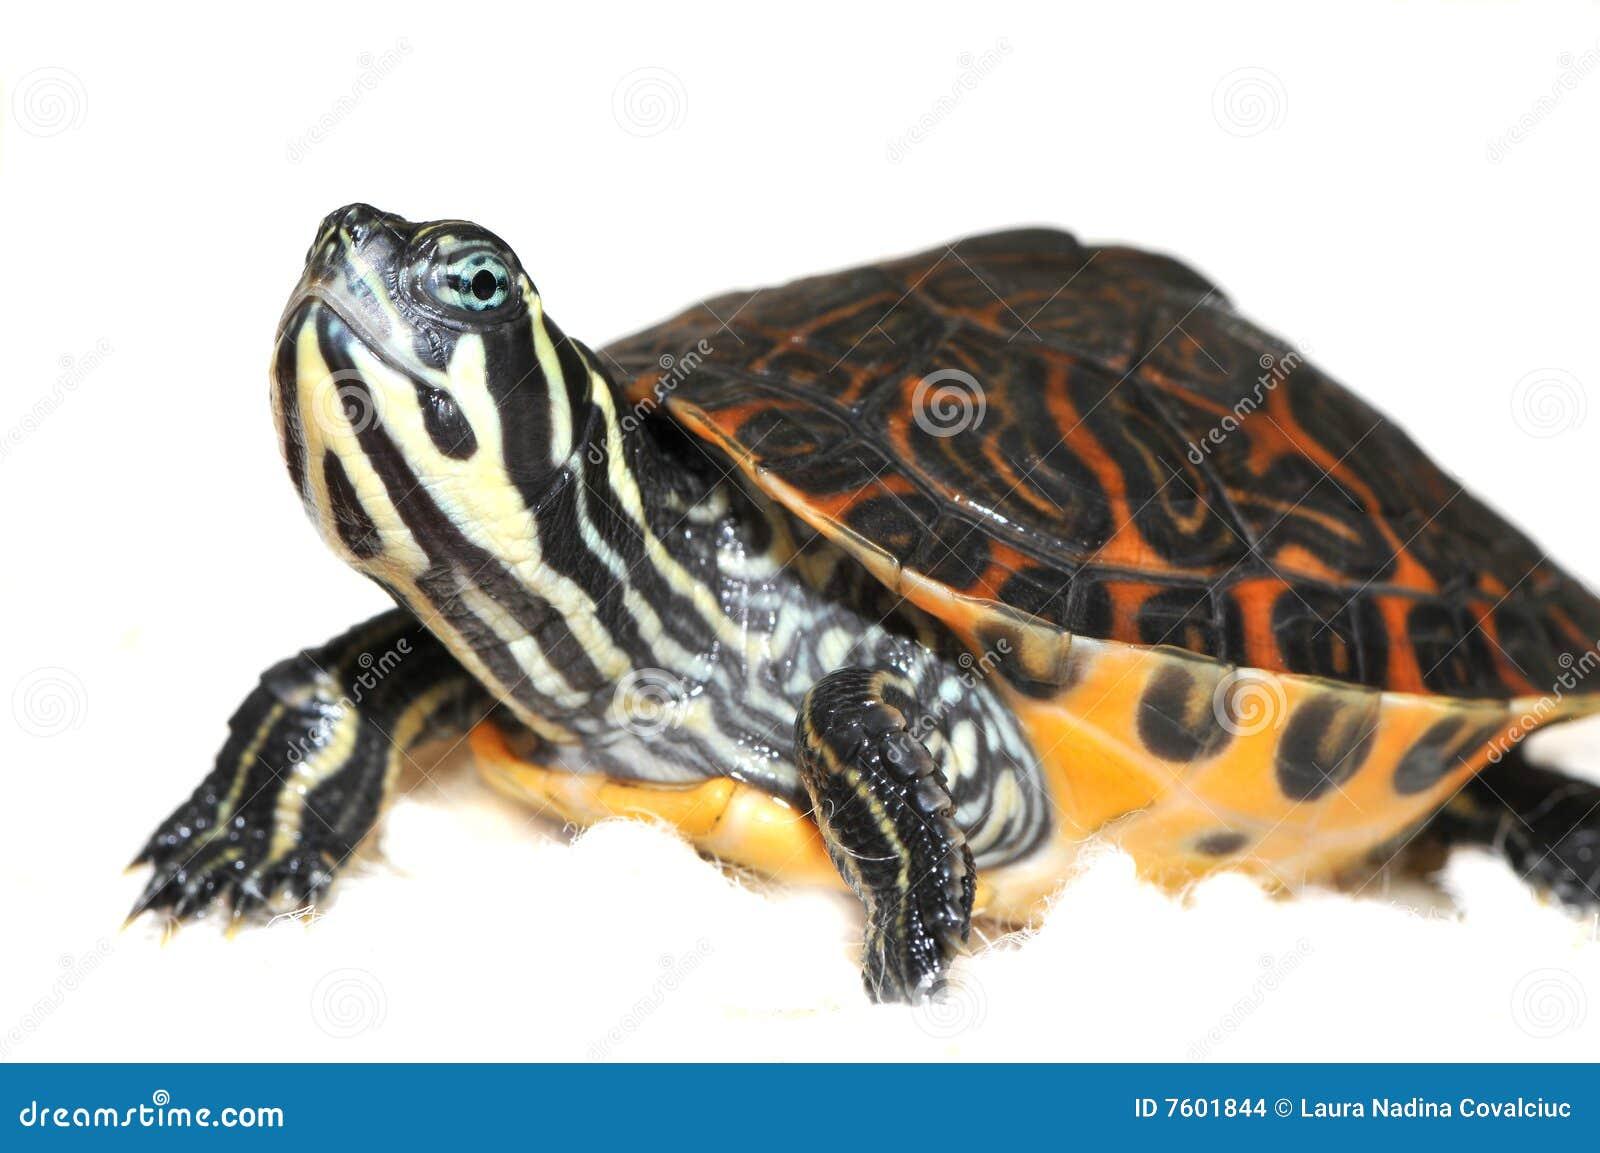 turtle white background - photo #43